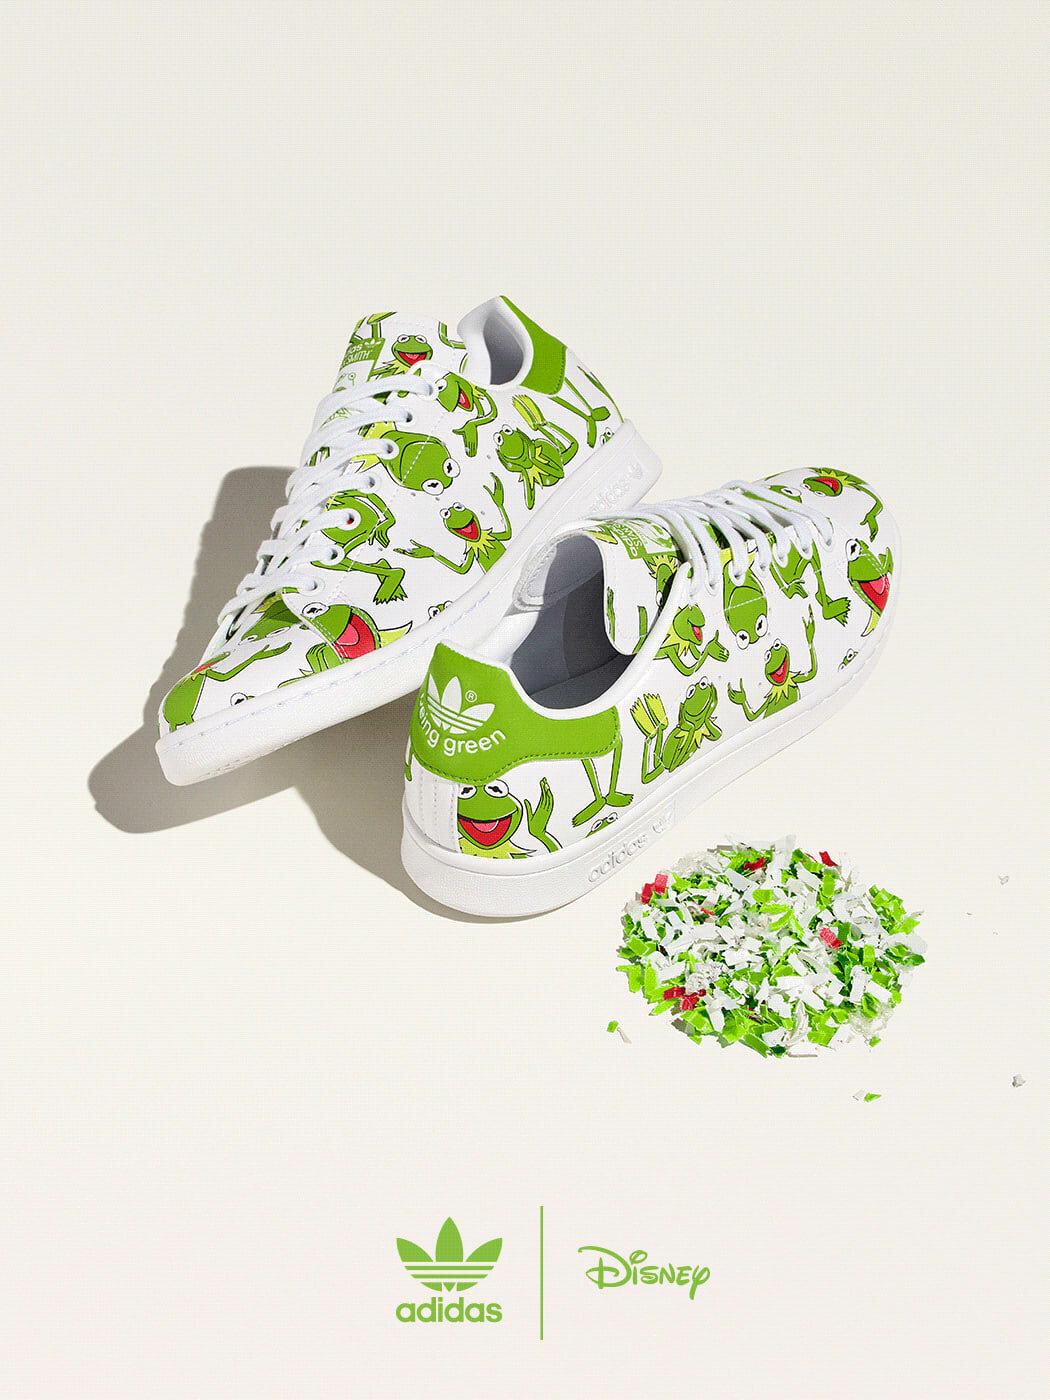 Kermit all over shoe